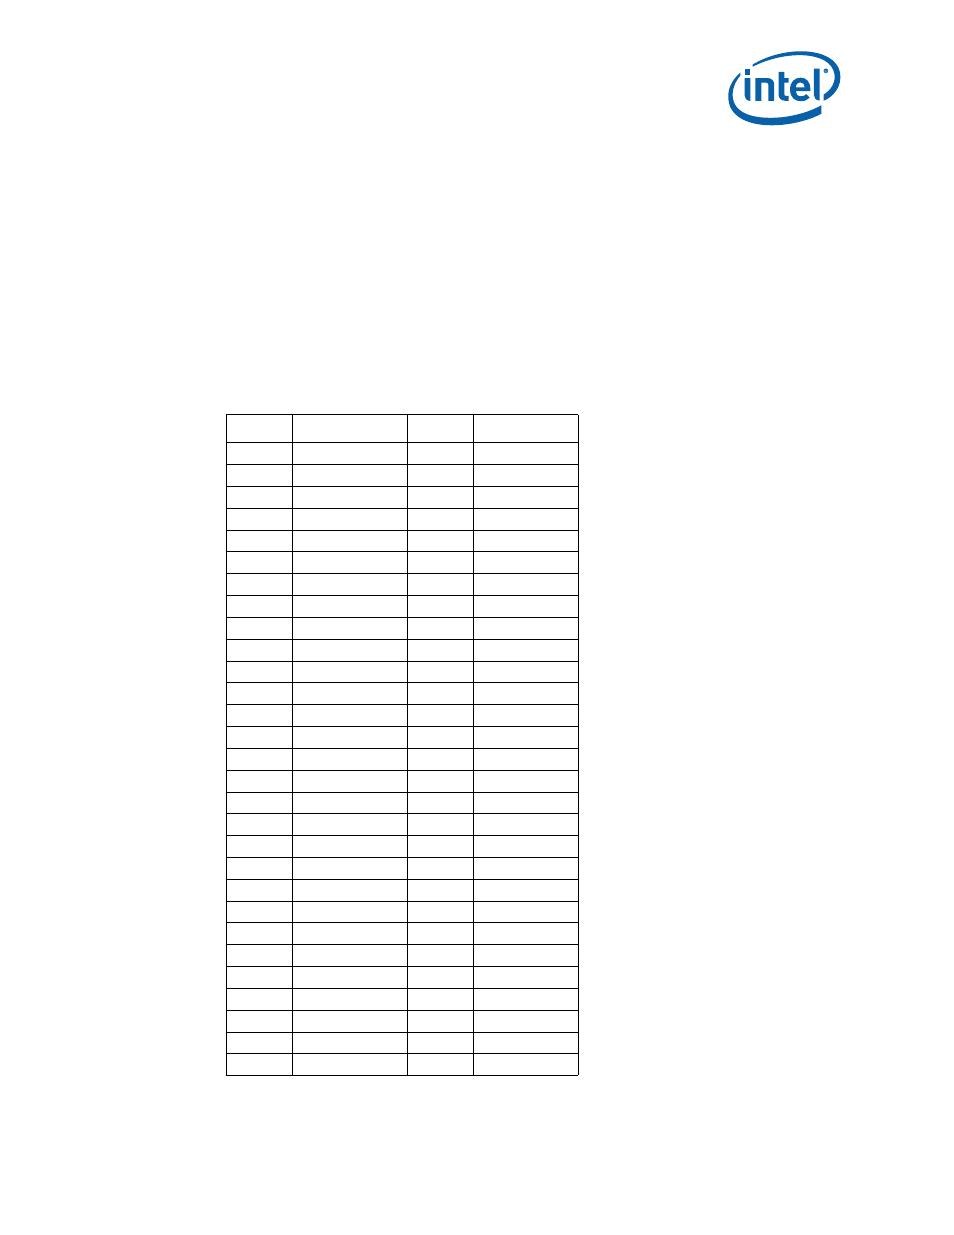 Pci express (x16), 13 pci express (x16) pinout (j6c1